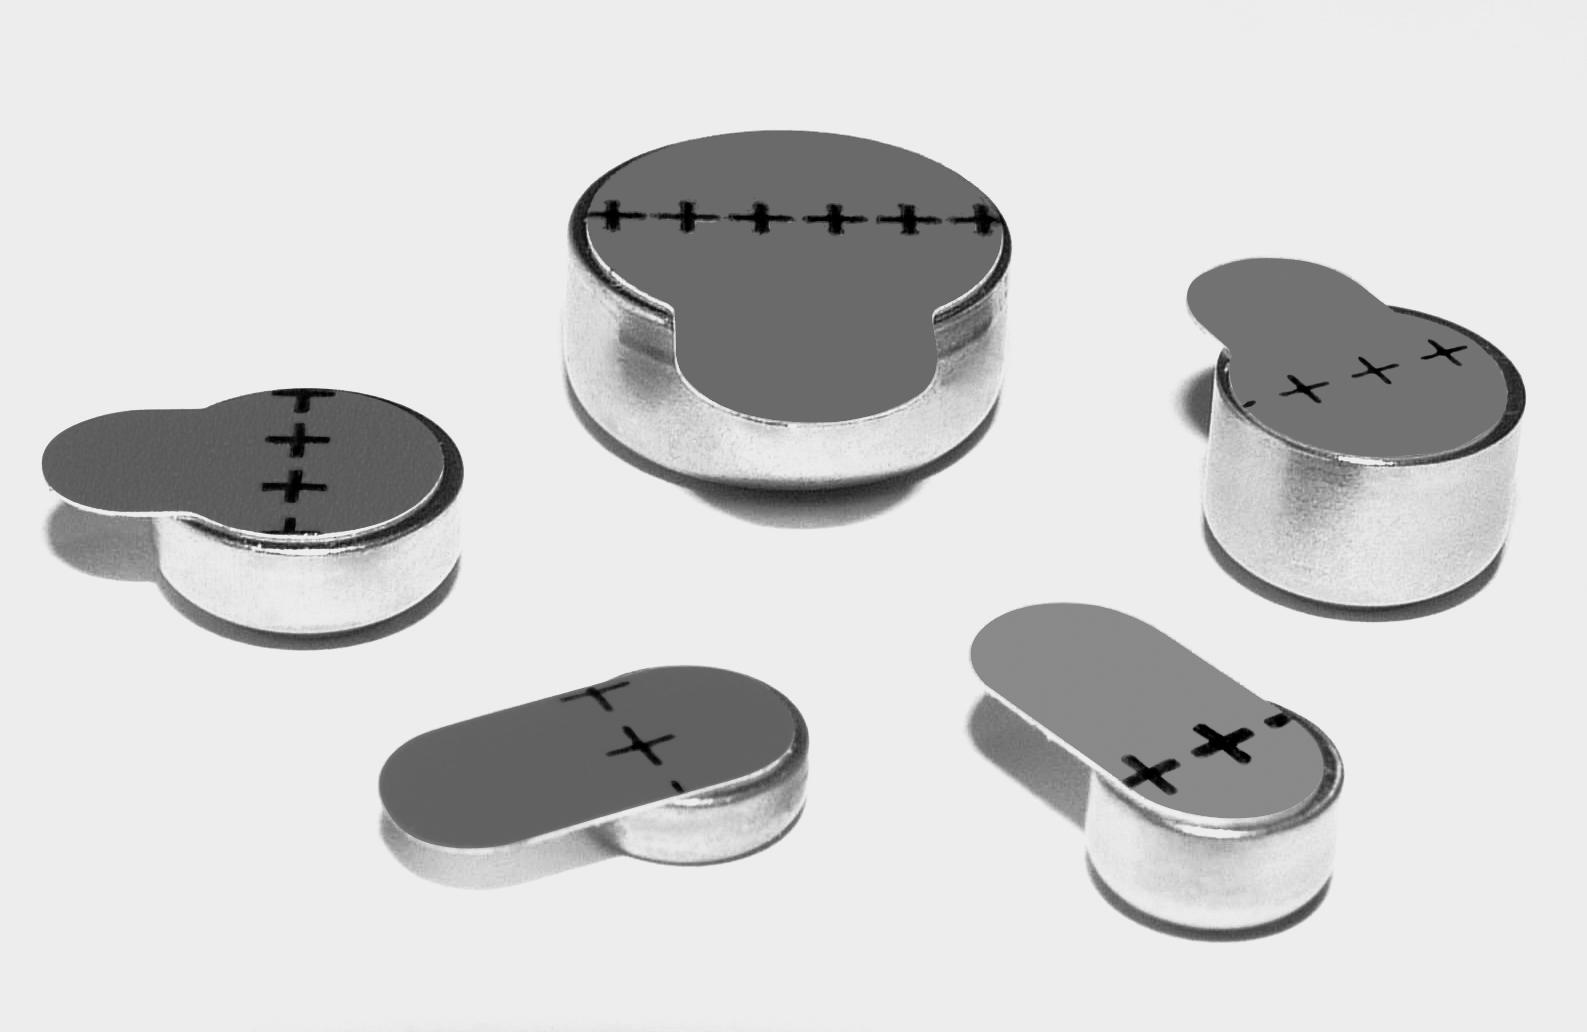 Ukuran Baterai Alat Bantu Pendengaran